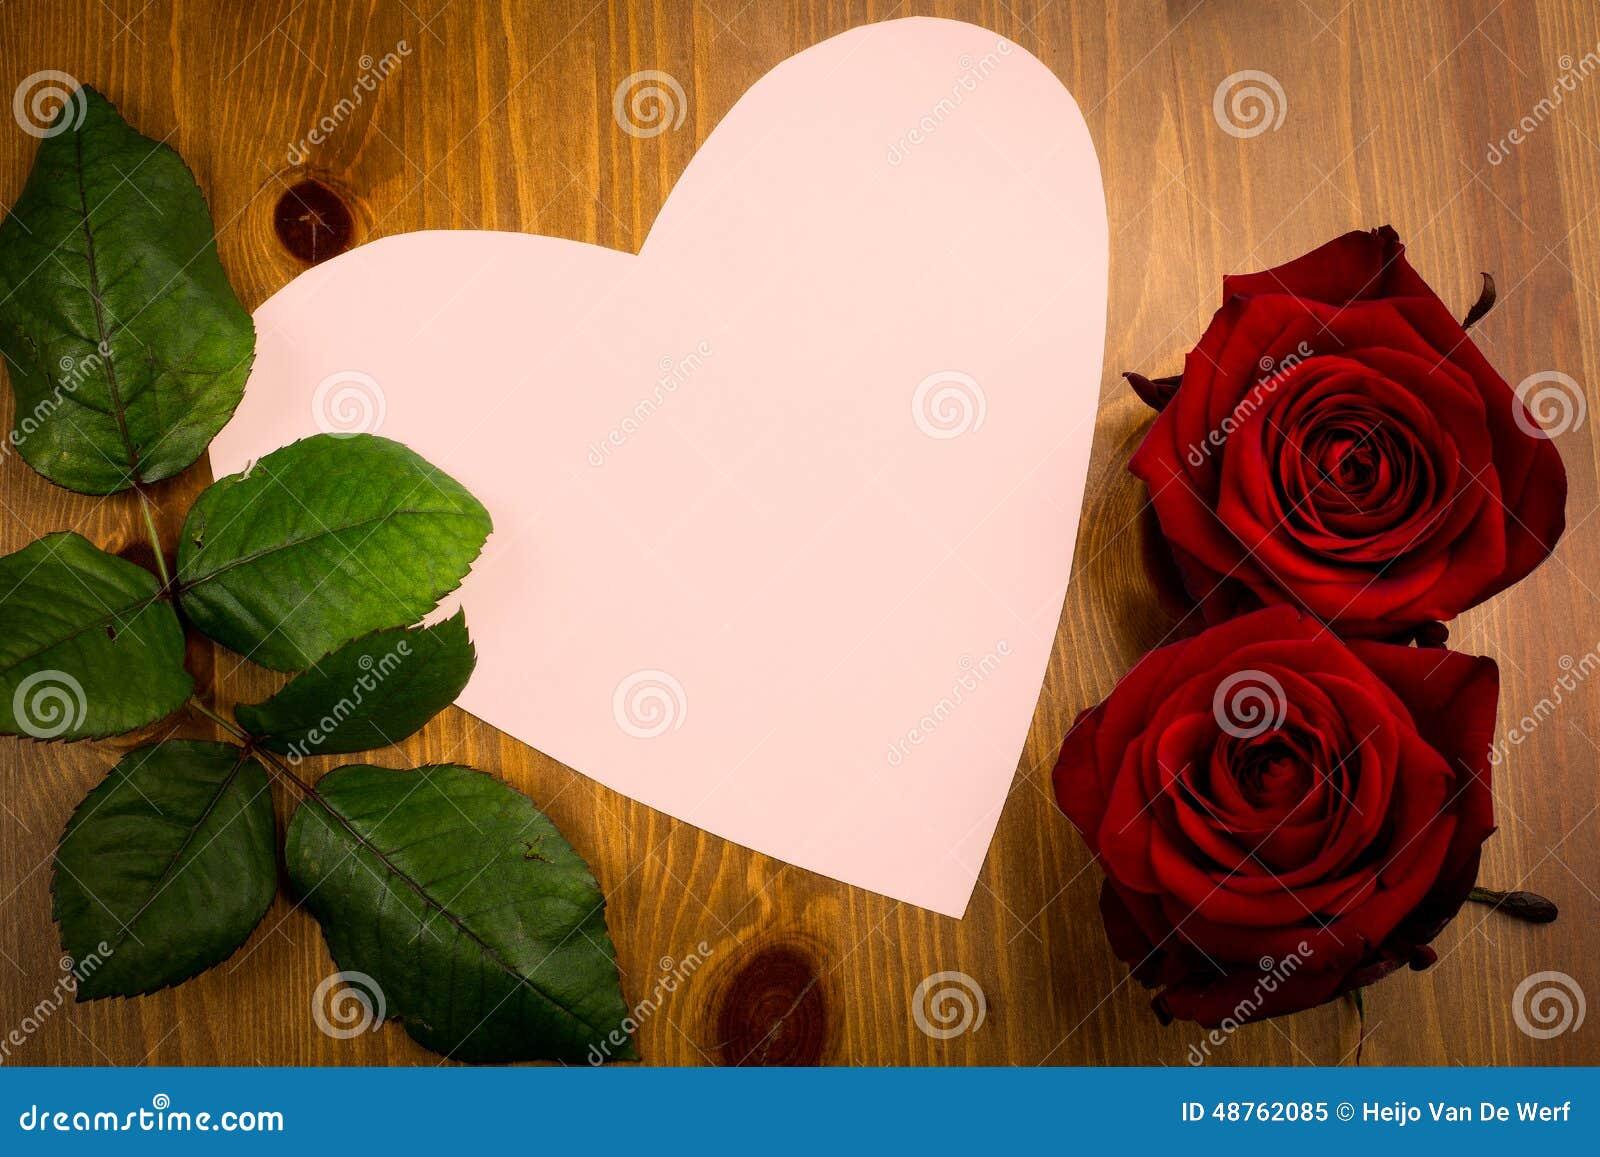 rosa herzgeformte anmerkung mit blatt und rose stockbild